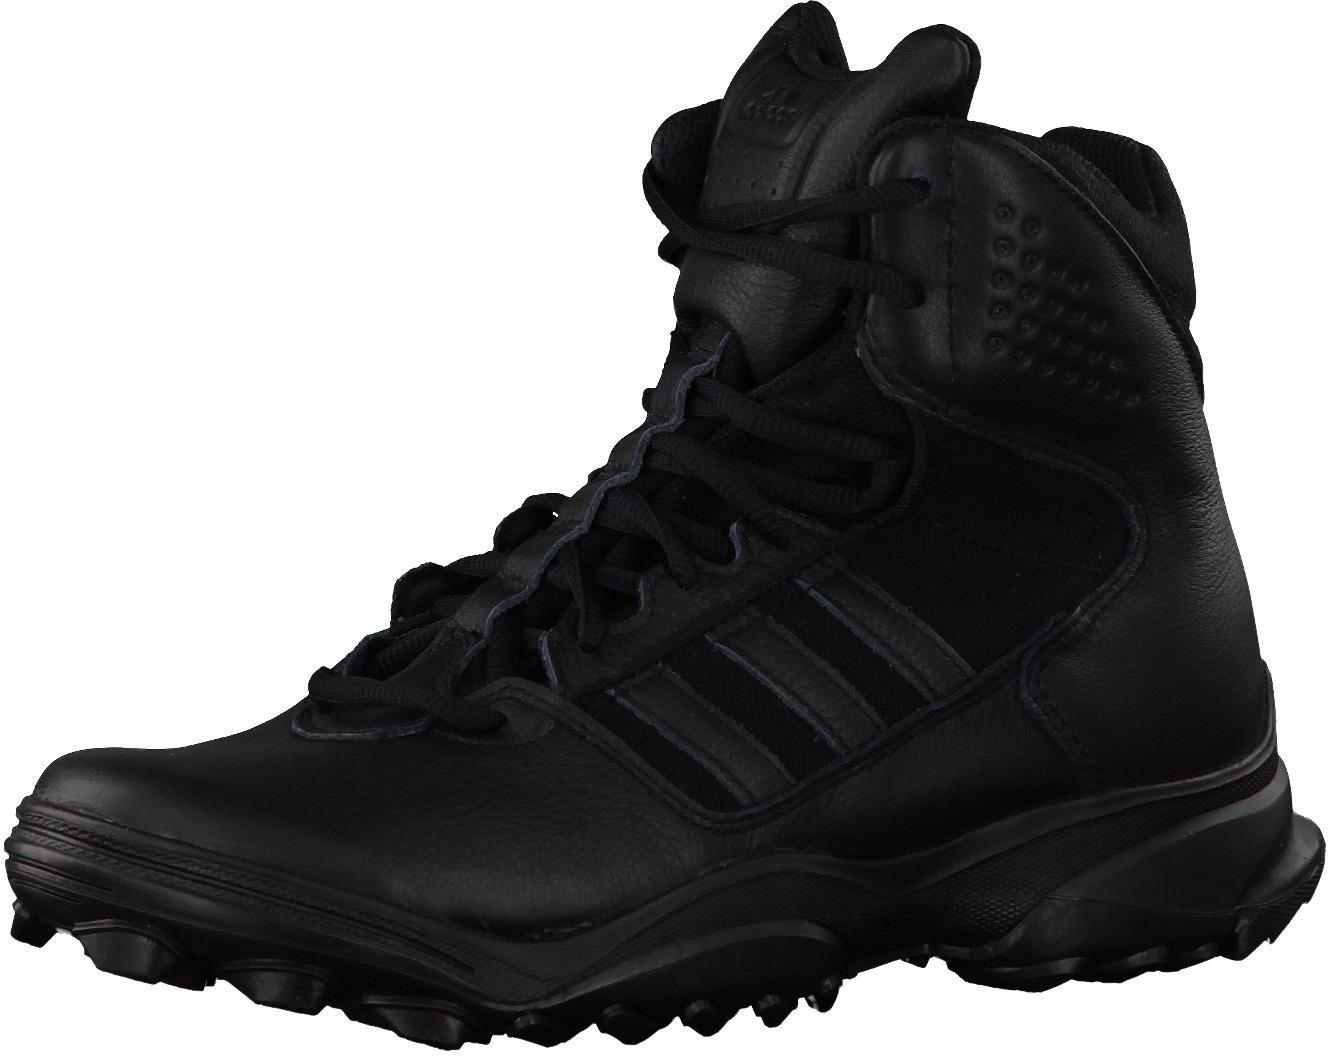 Adidas GSG9 9.7